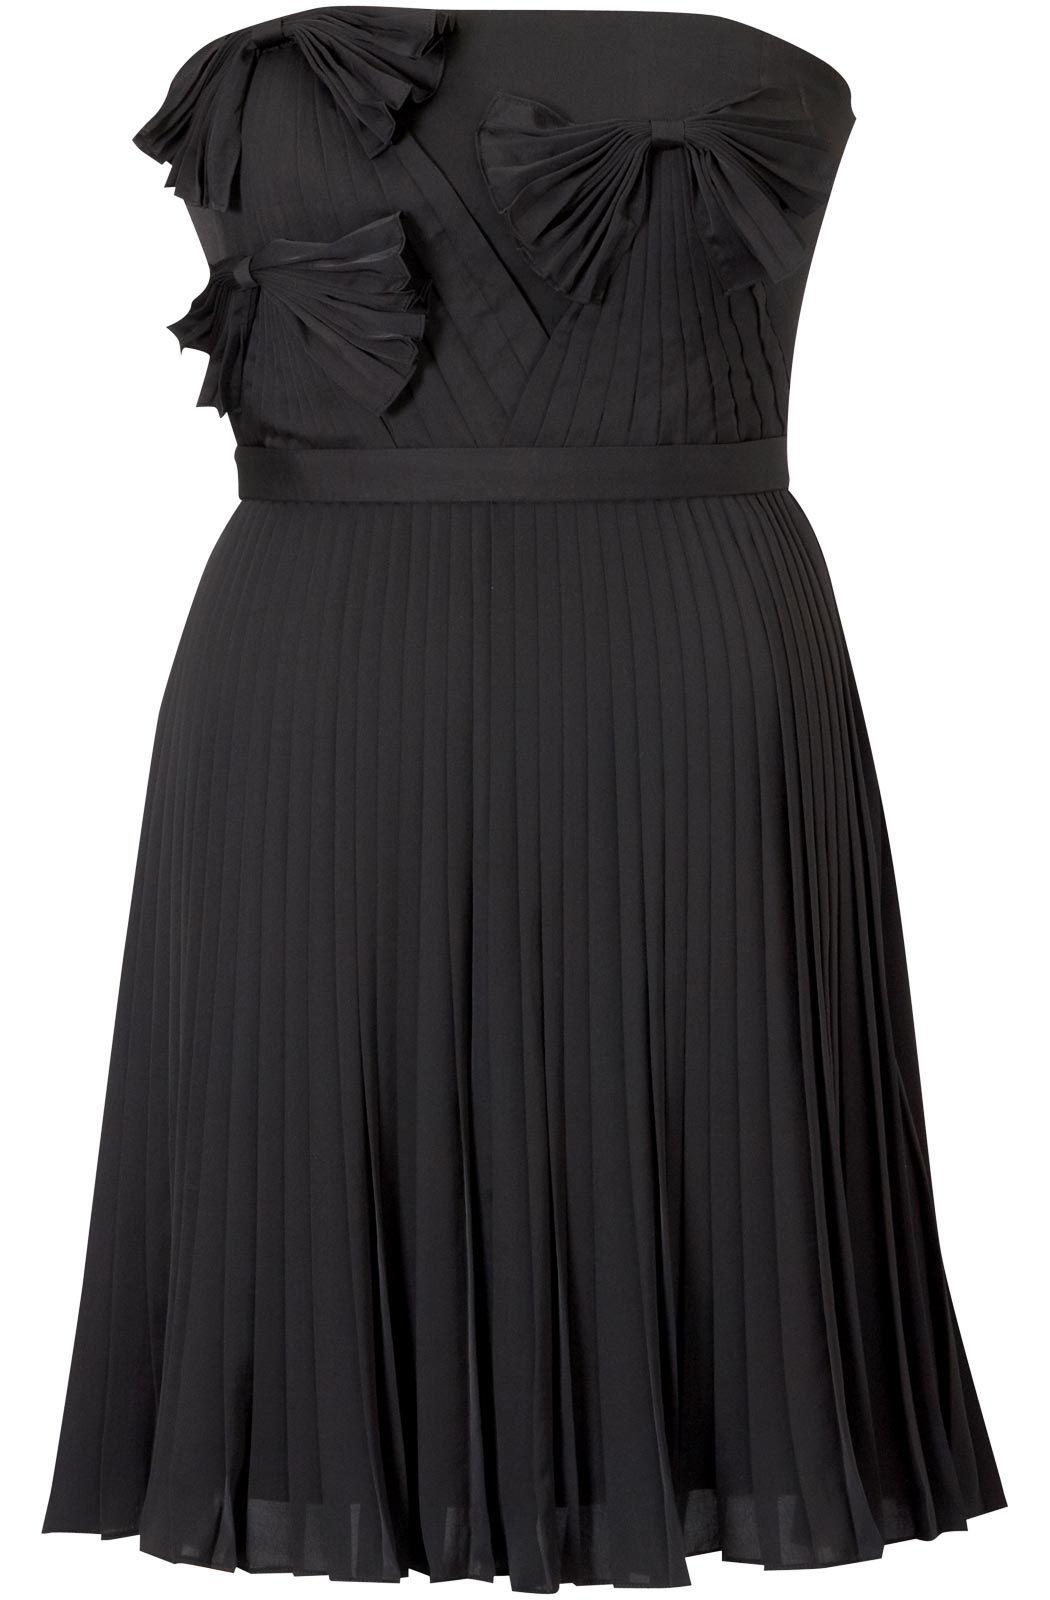 Red and black wedding dress  short black bridesmaid dress  Red Cream u Black Wedding